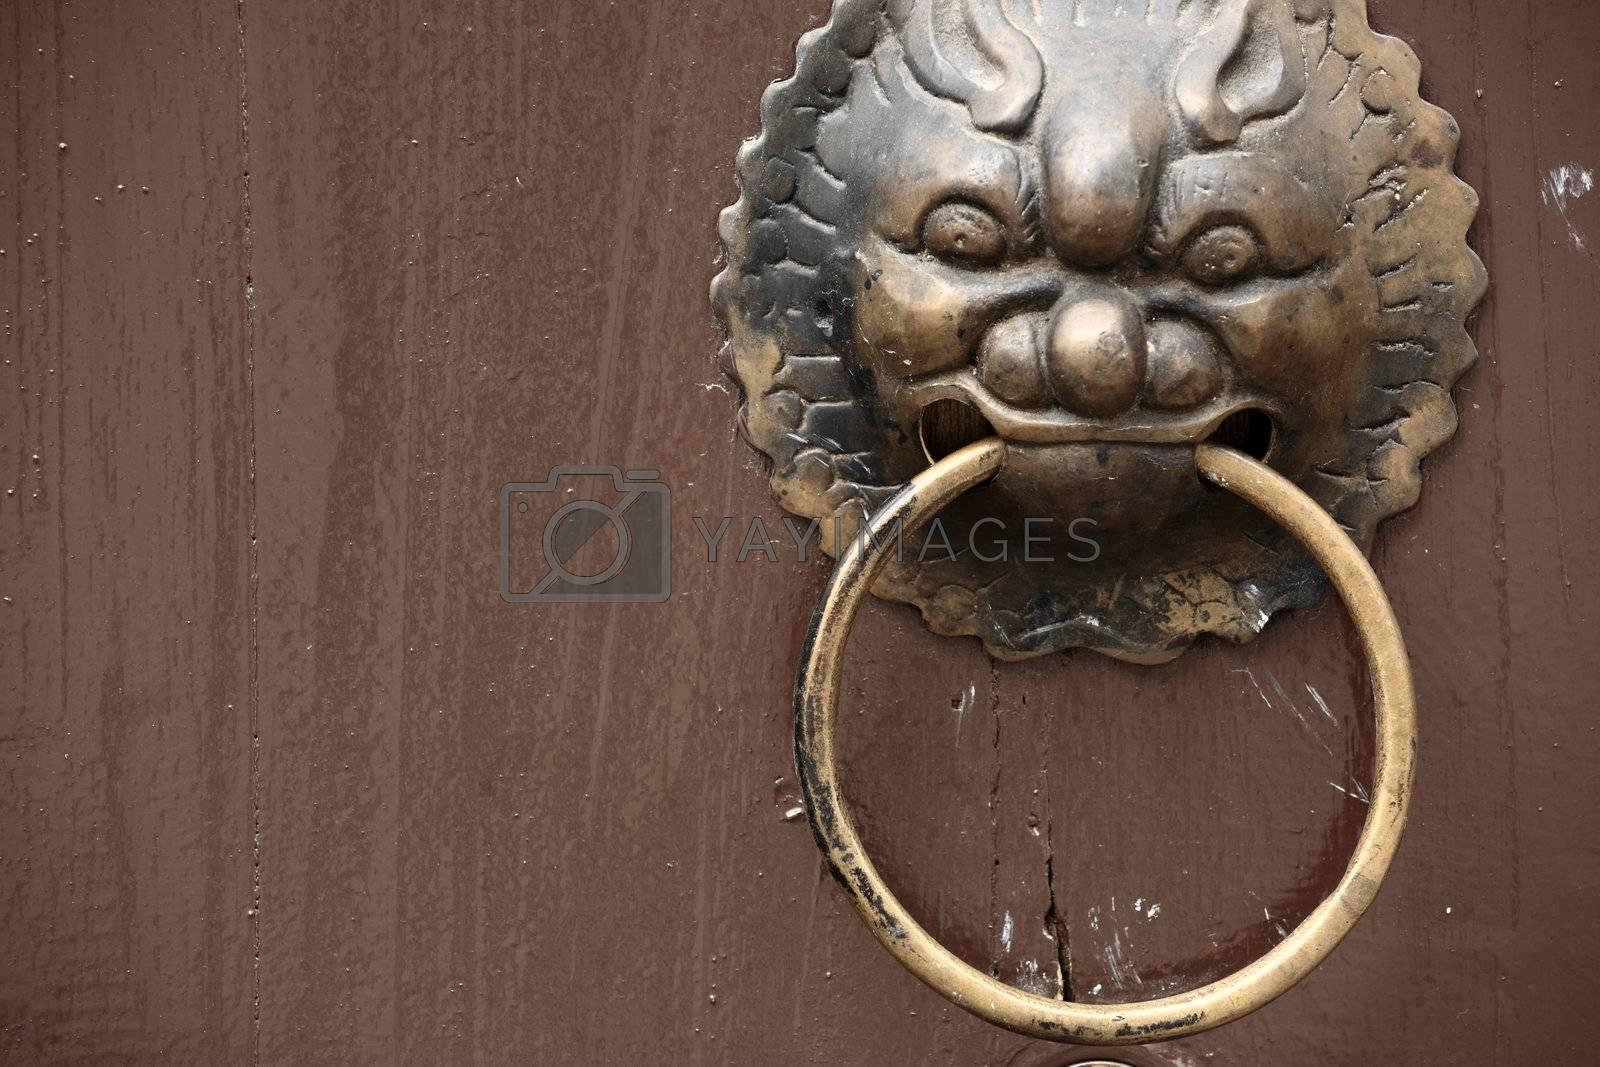 Royalty free image of antique oriental door knocker by leungchopan